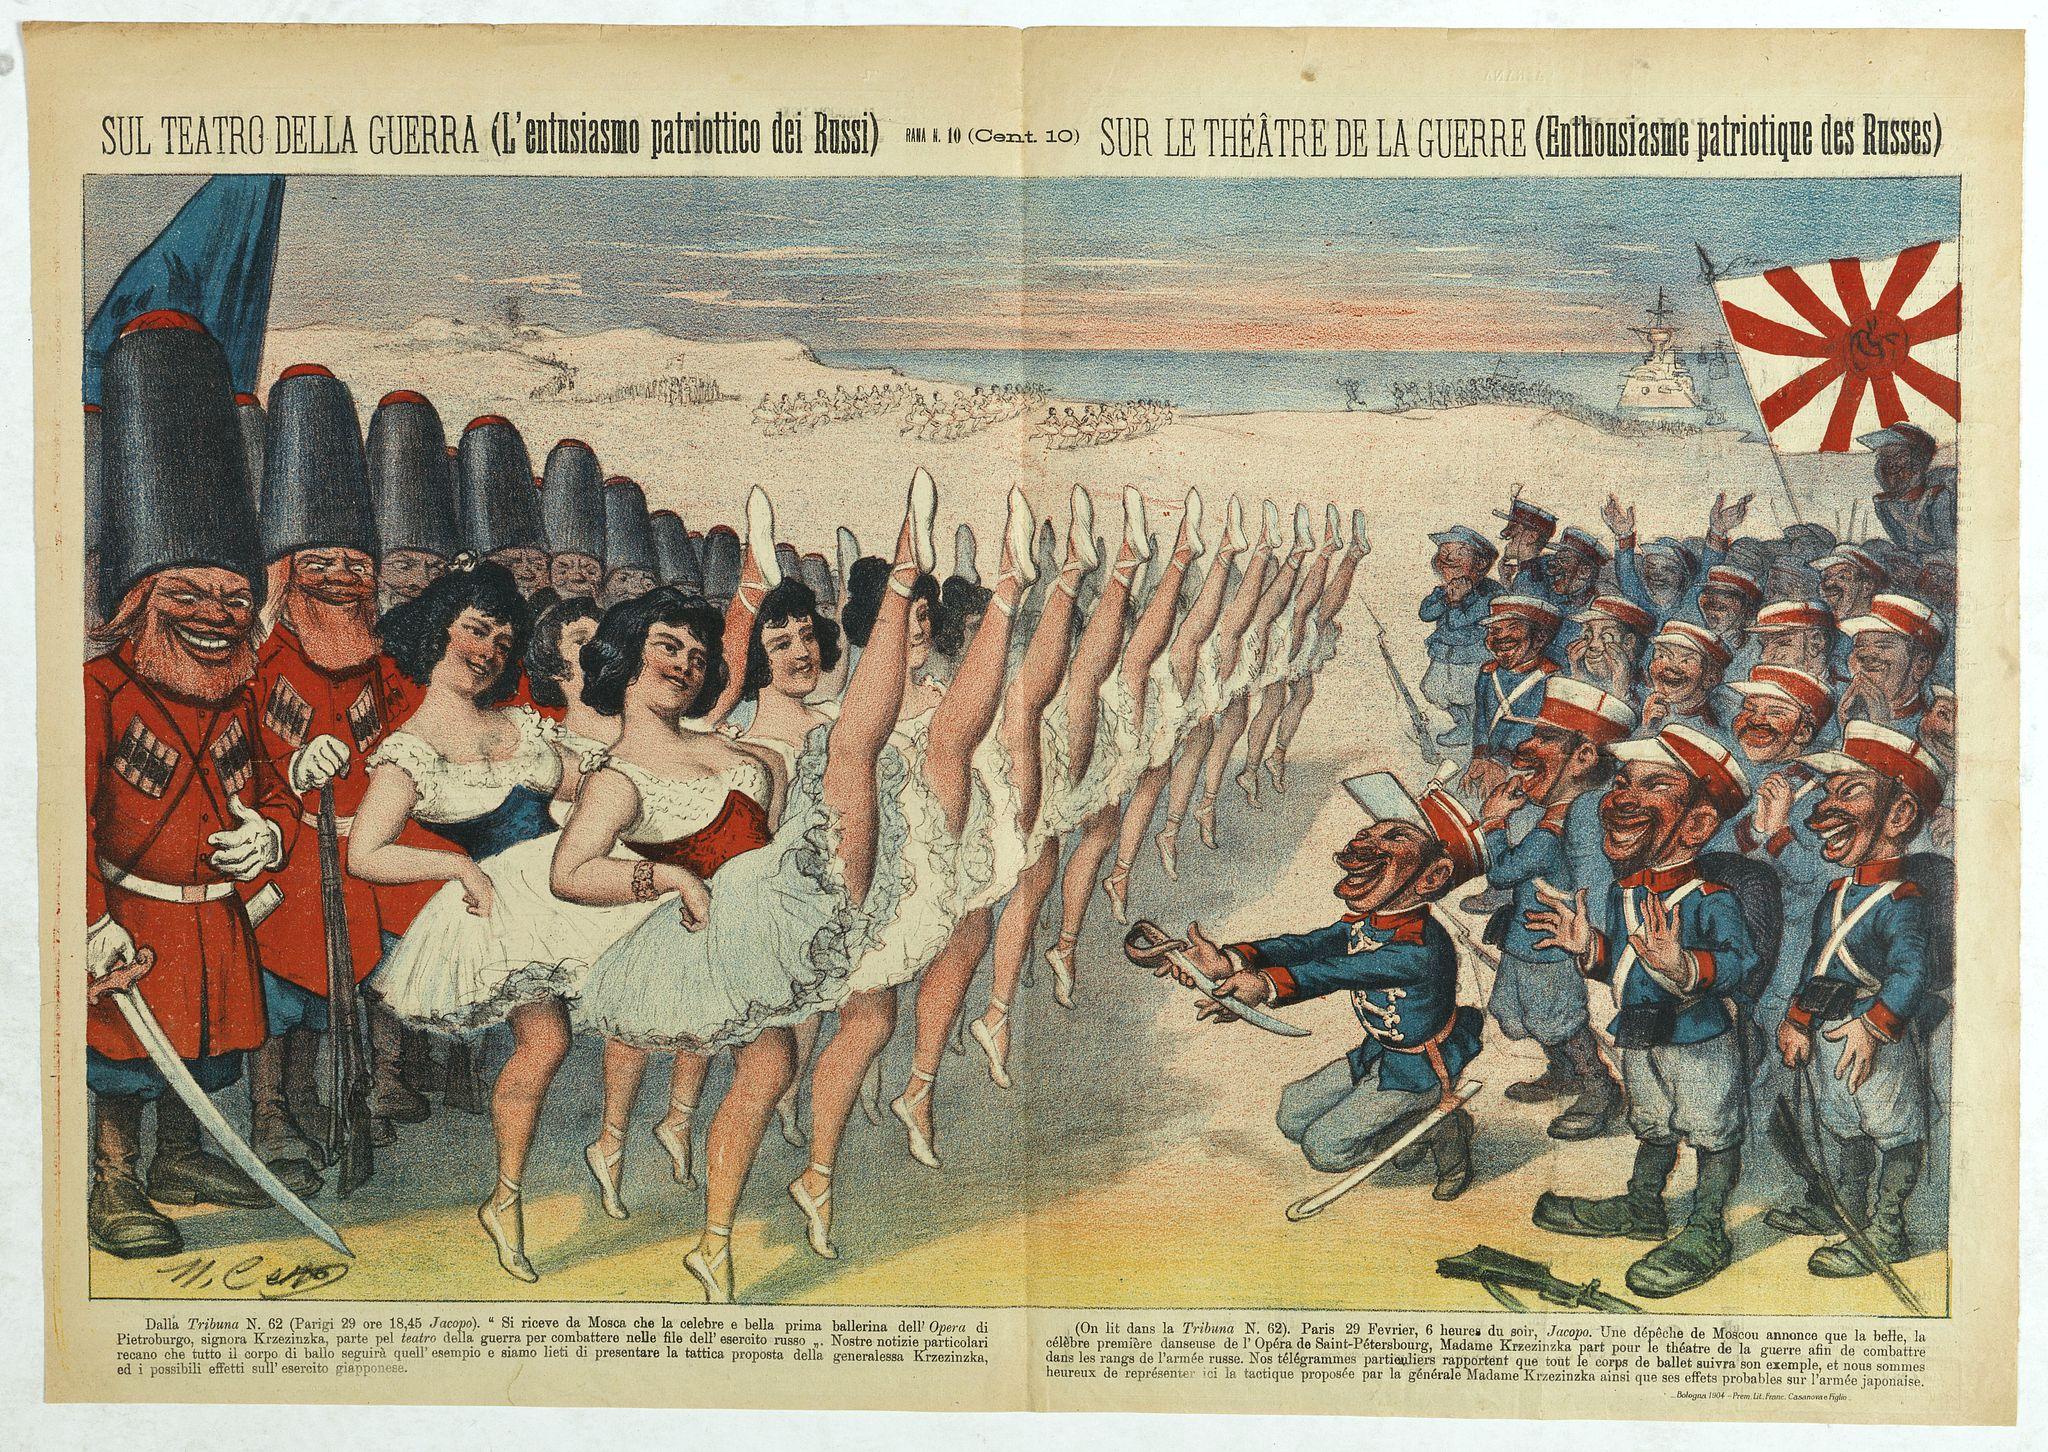 CETTO, M. -  Sul teatro della guerra (L'entusiasmo patriottico dei Russi) - Rana N. 10 (Cent.10) - Sur le théâtre de la guerre (enthousiasme patriotique des Russes).